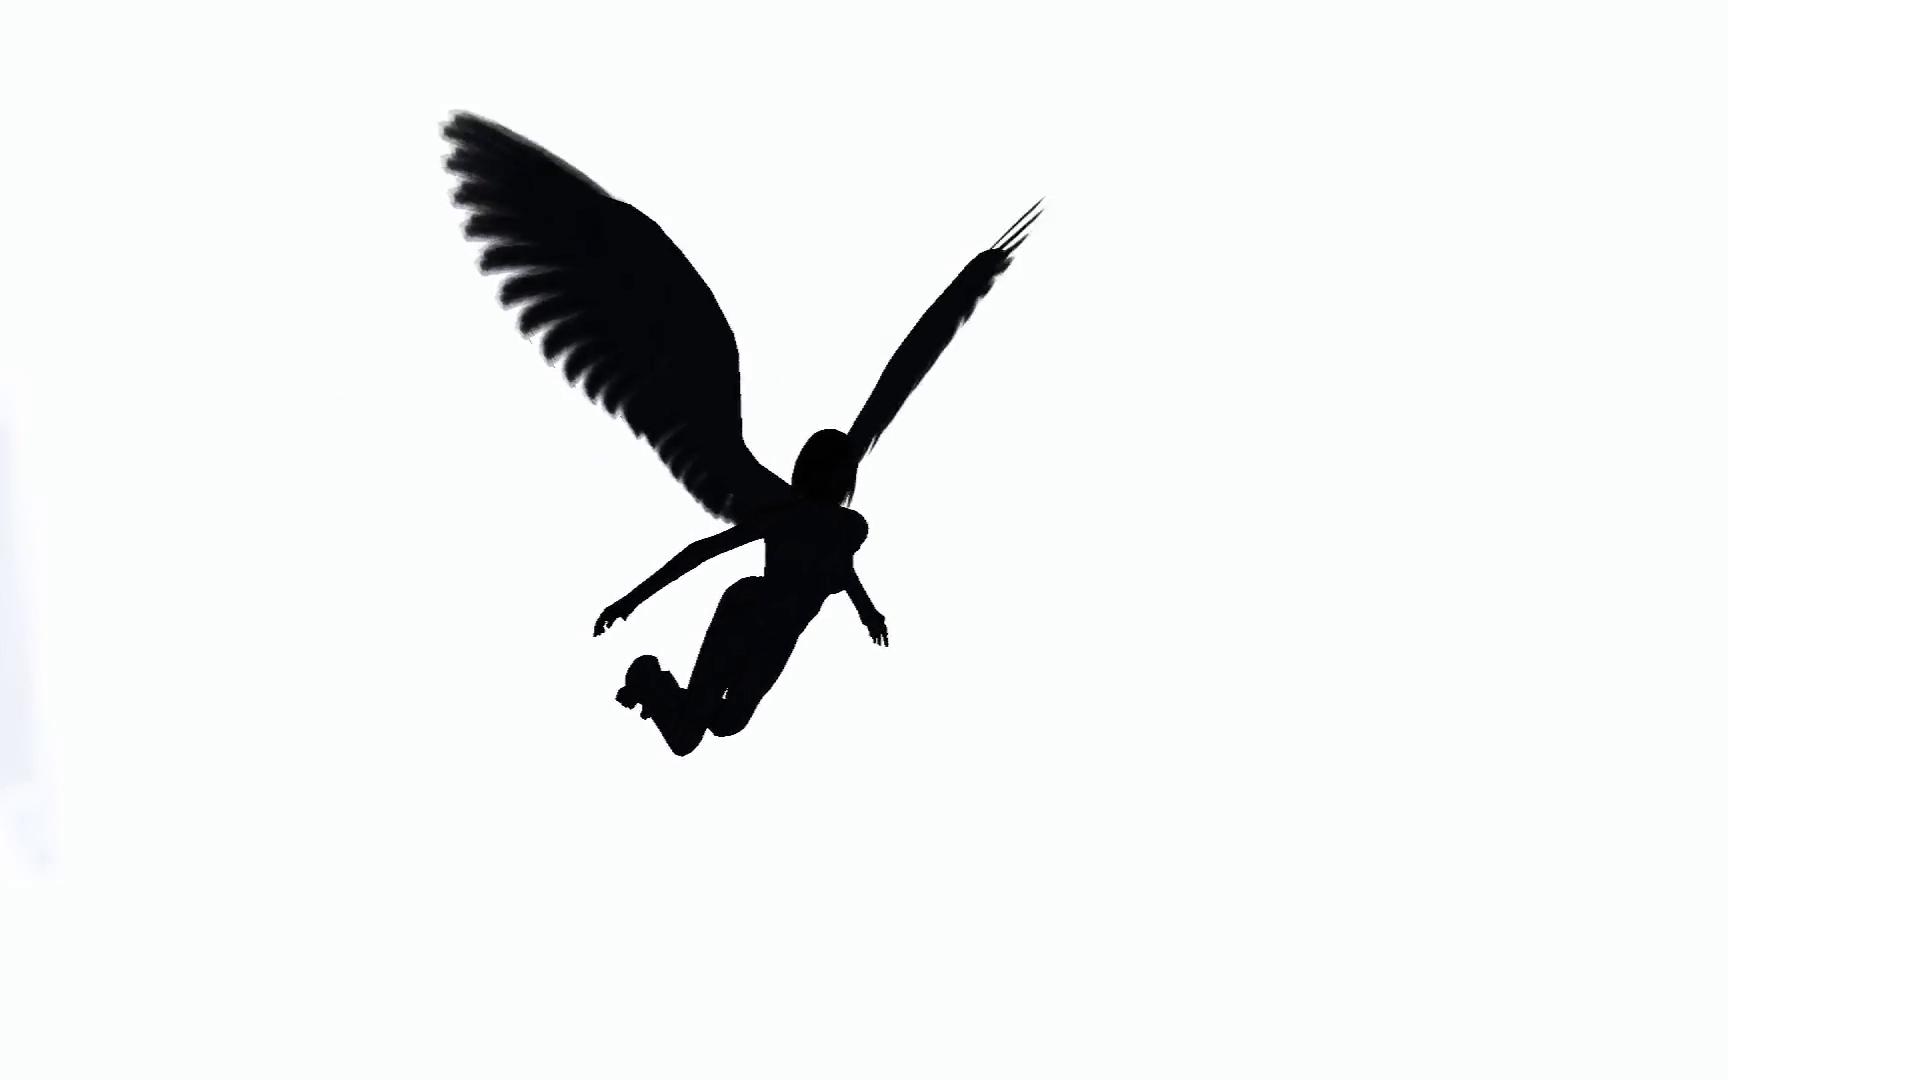 1920x1080 Female Angel Silhouette Flying Across Screen Motion Background